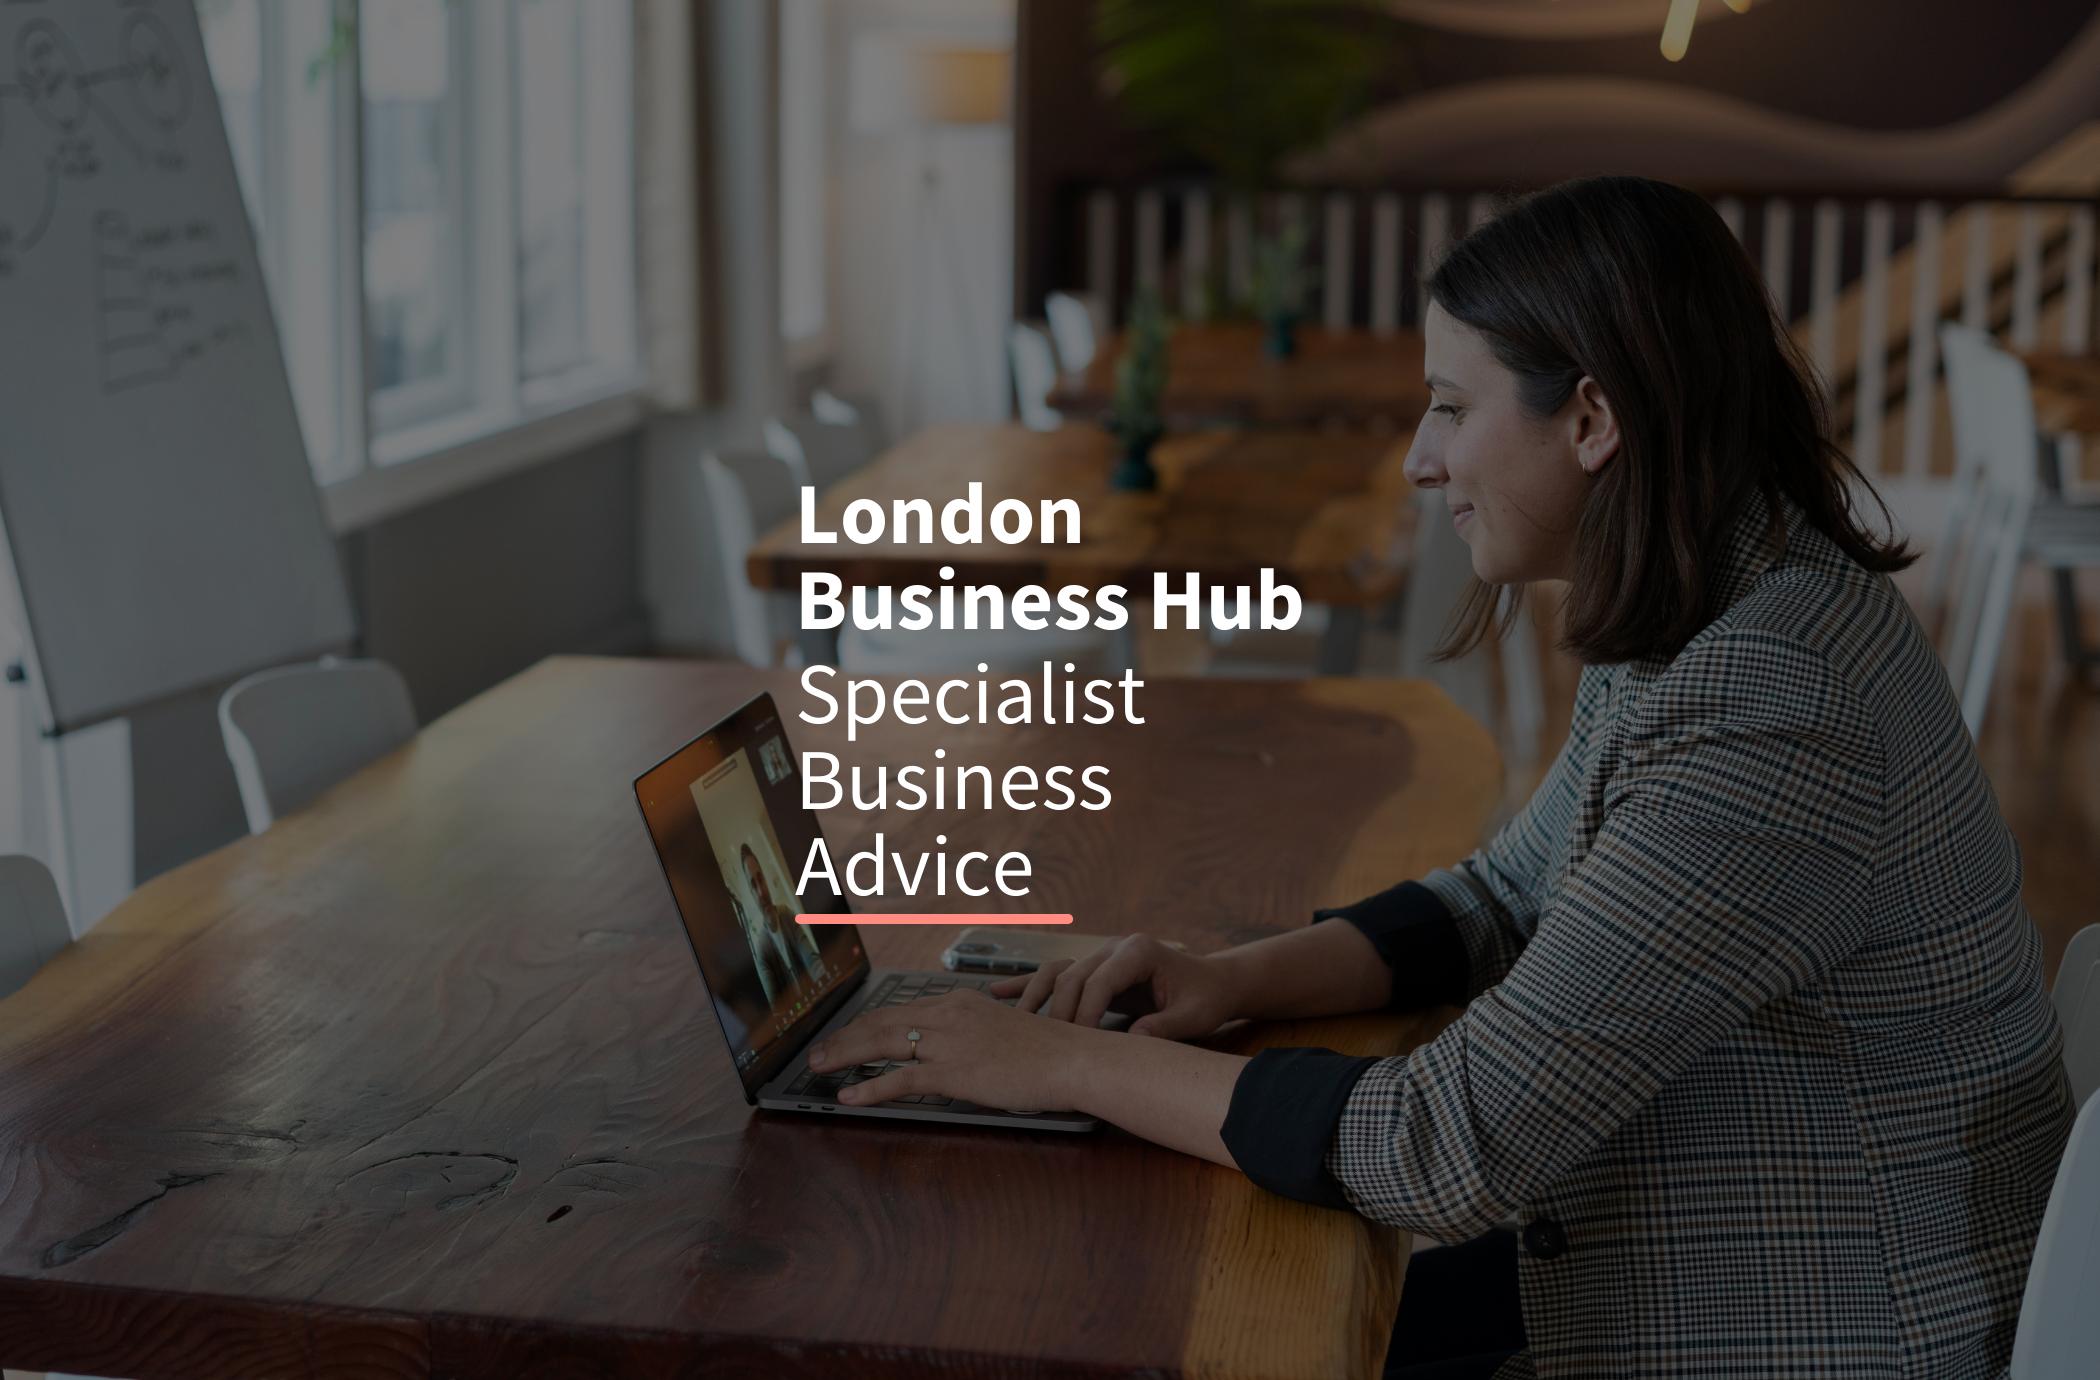 Specialist Business Advice